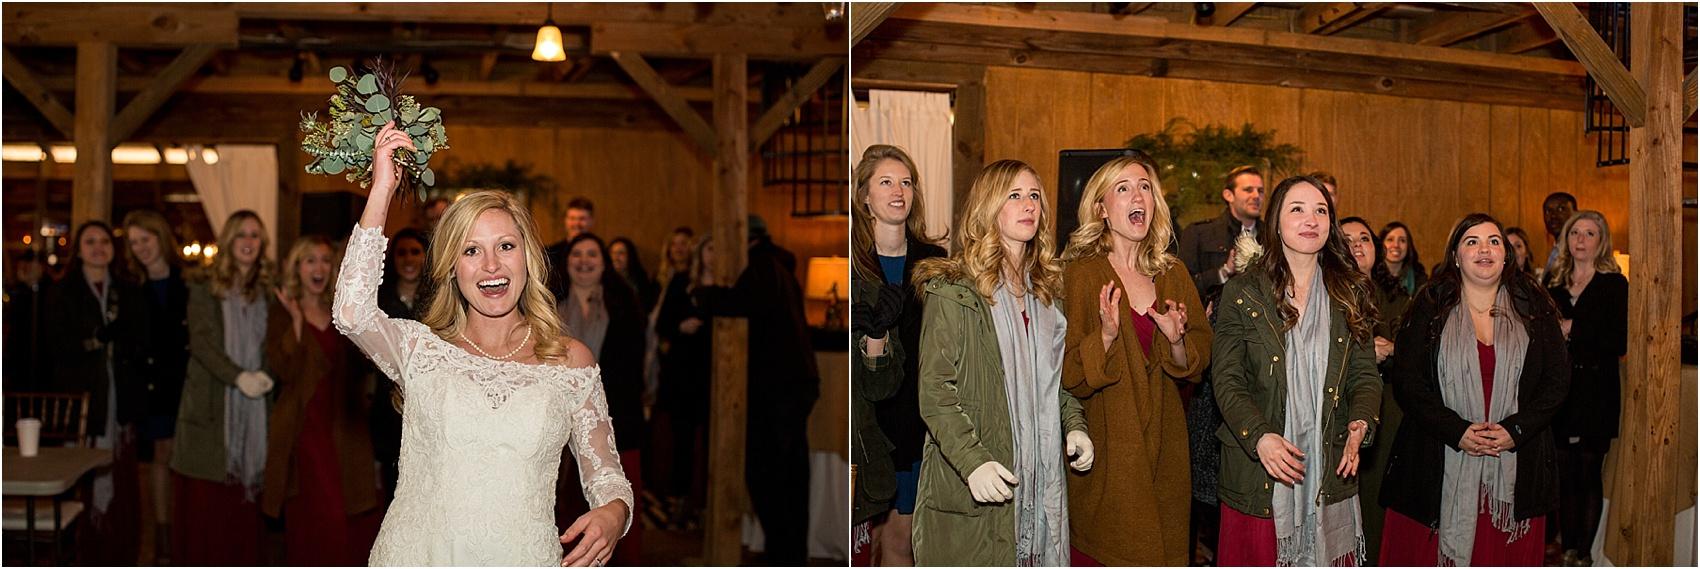 Bethune Wedding- Highlights-134.jpg